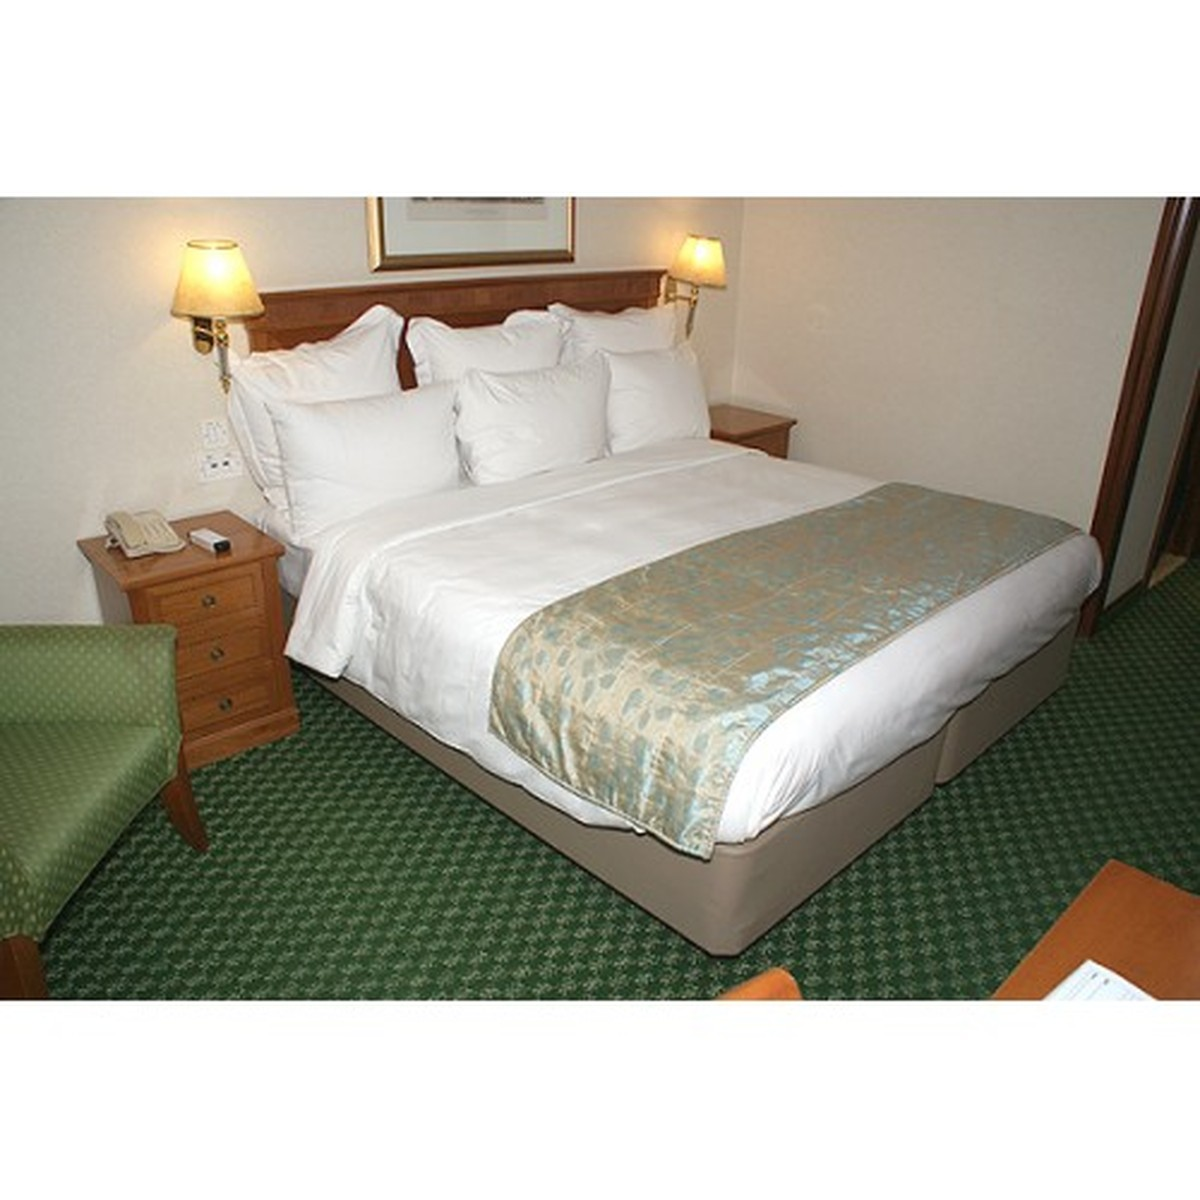 Secondhand hotel furniture mayfair furniture caterfair for Sale bedroom furniture uk